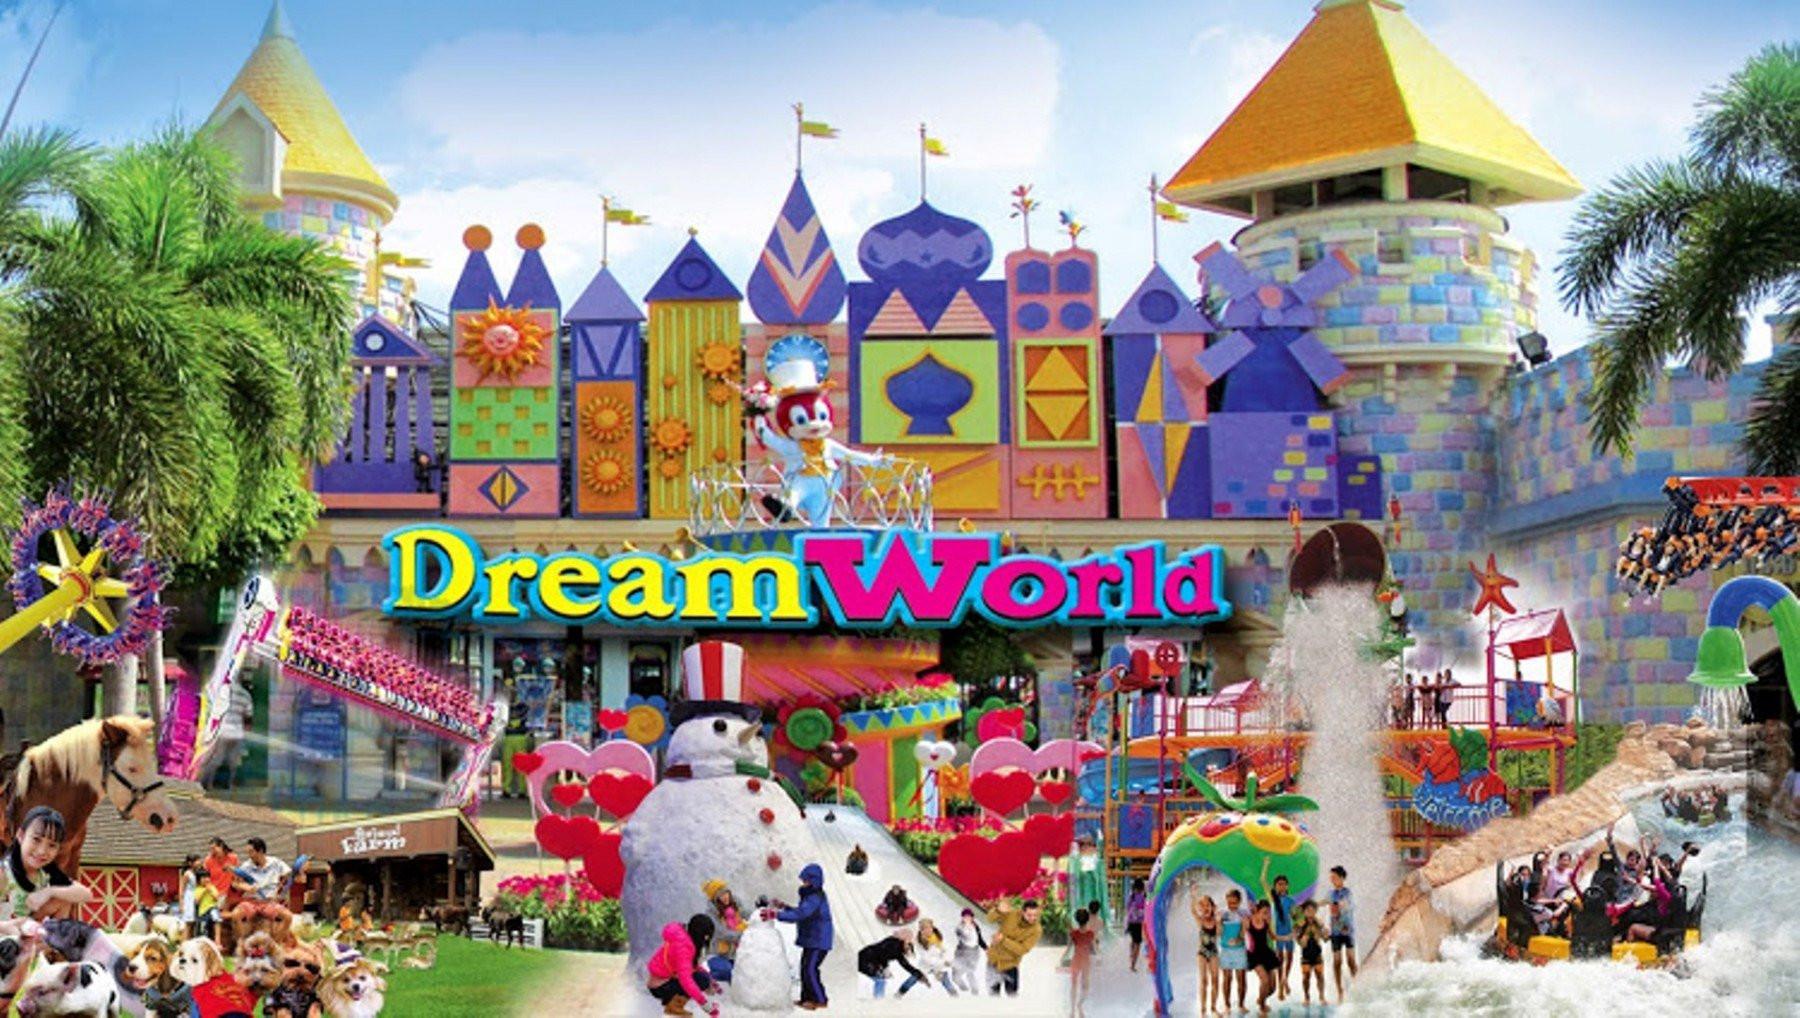 Dream World Бангкок.jpg